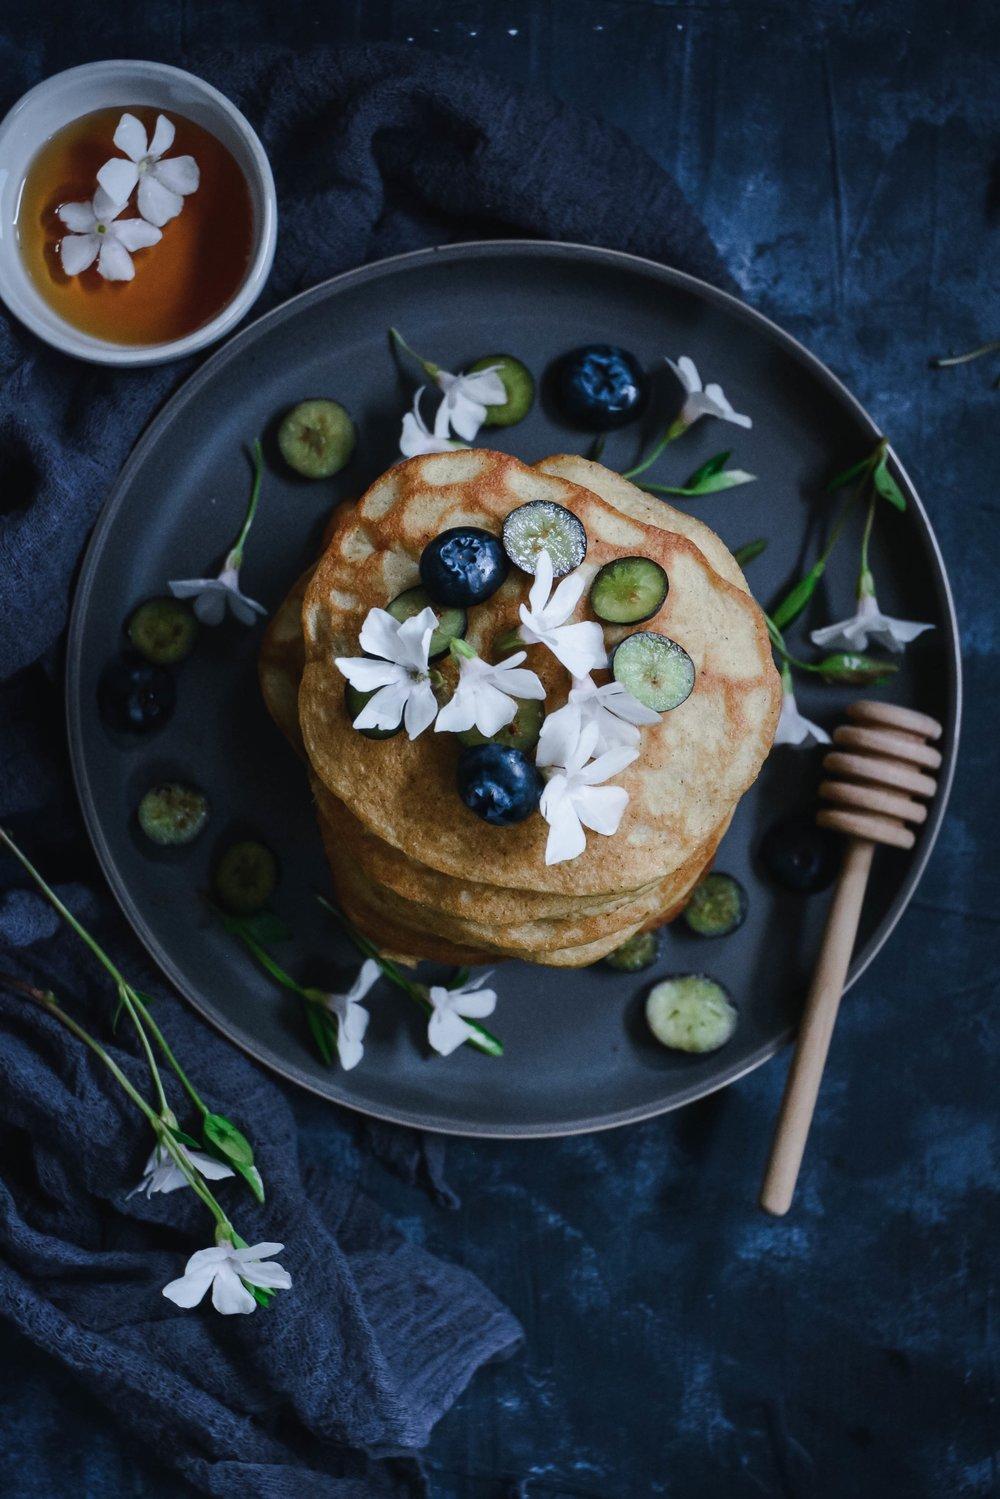 cardamom pancakes with orange blossom water